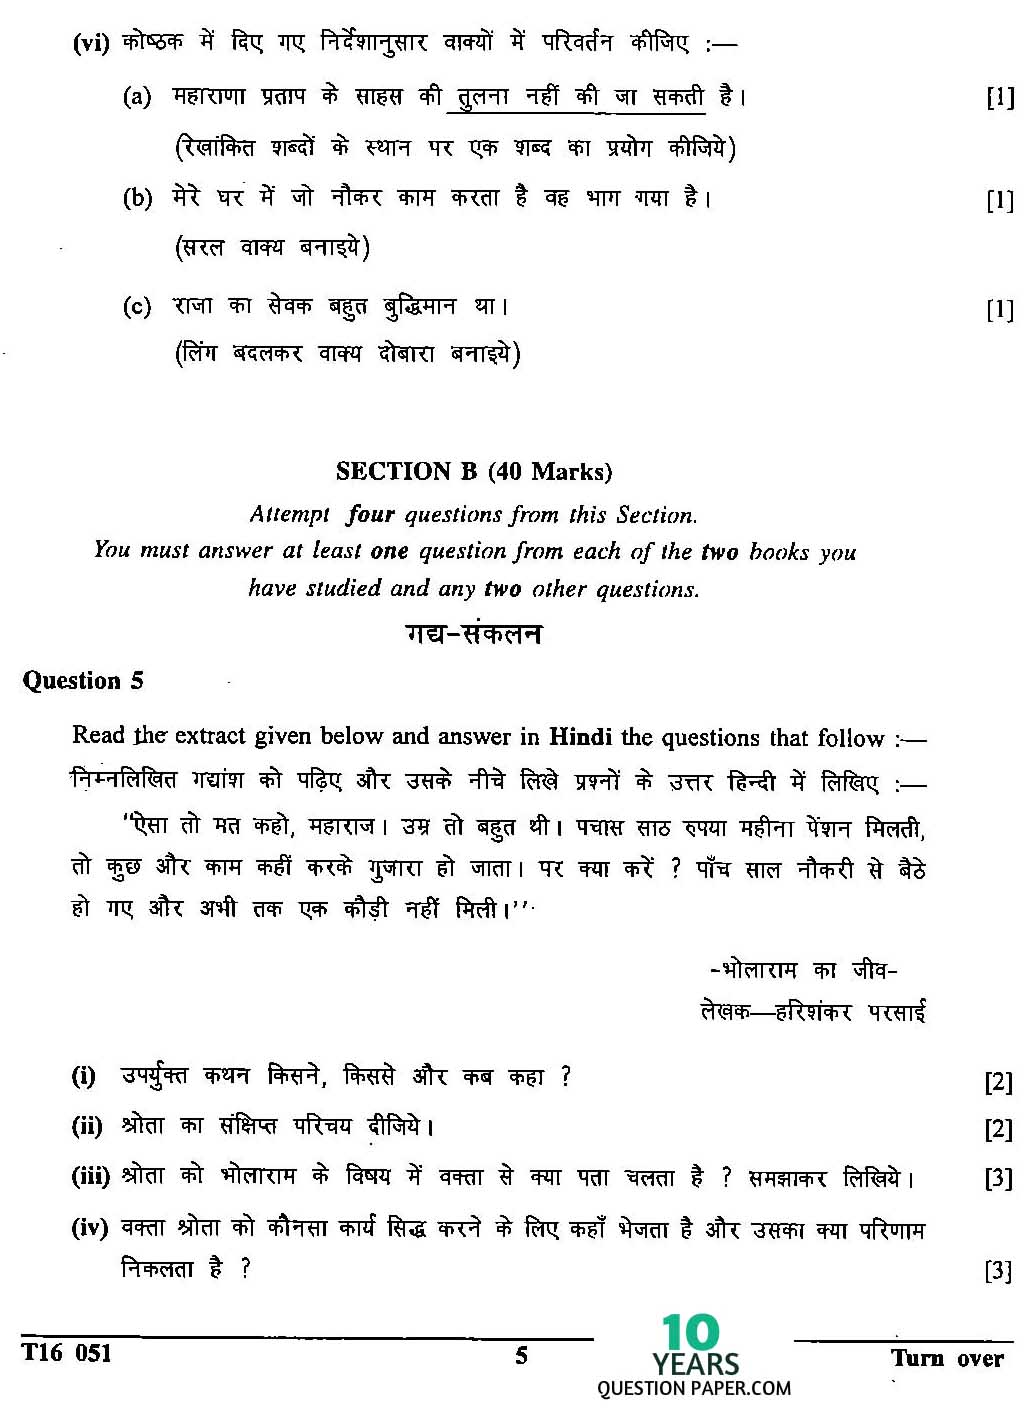 ICSE Class 10 Hindi 2016 Question Paper